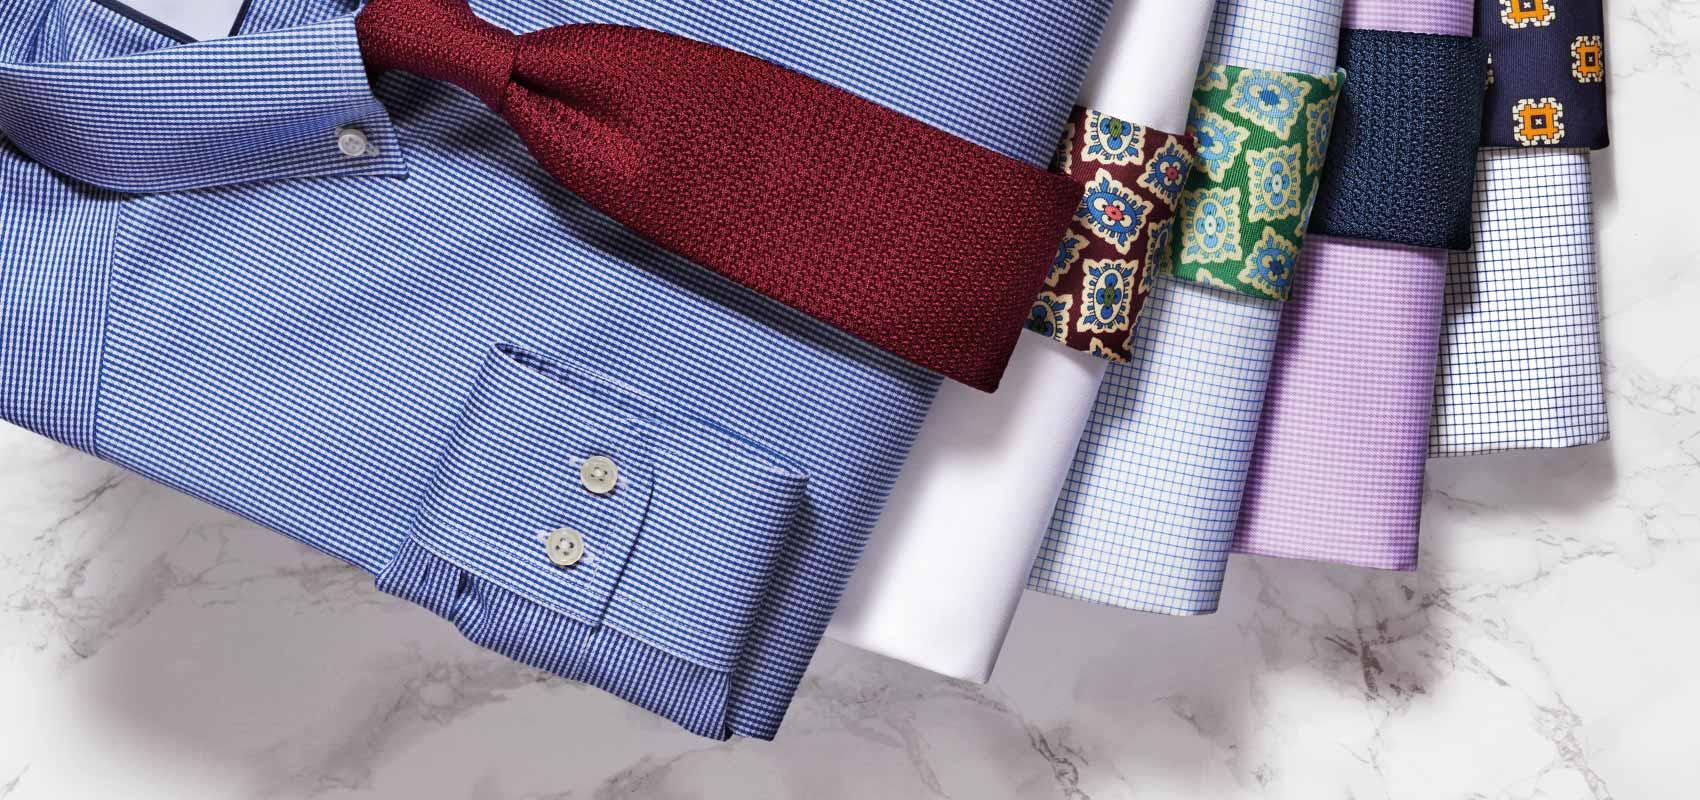 Charles Tyrwhitt formal shirts